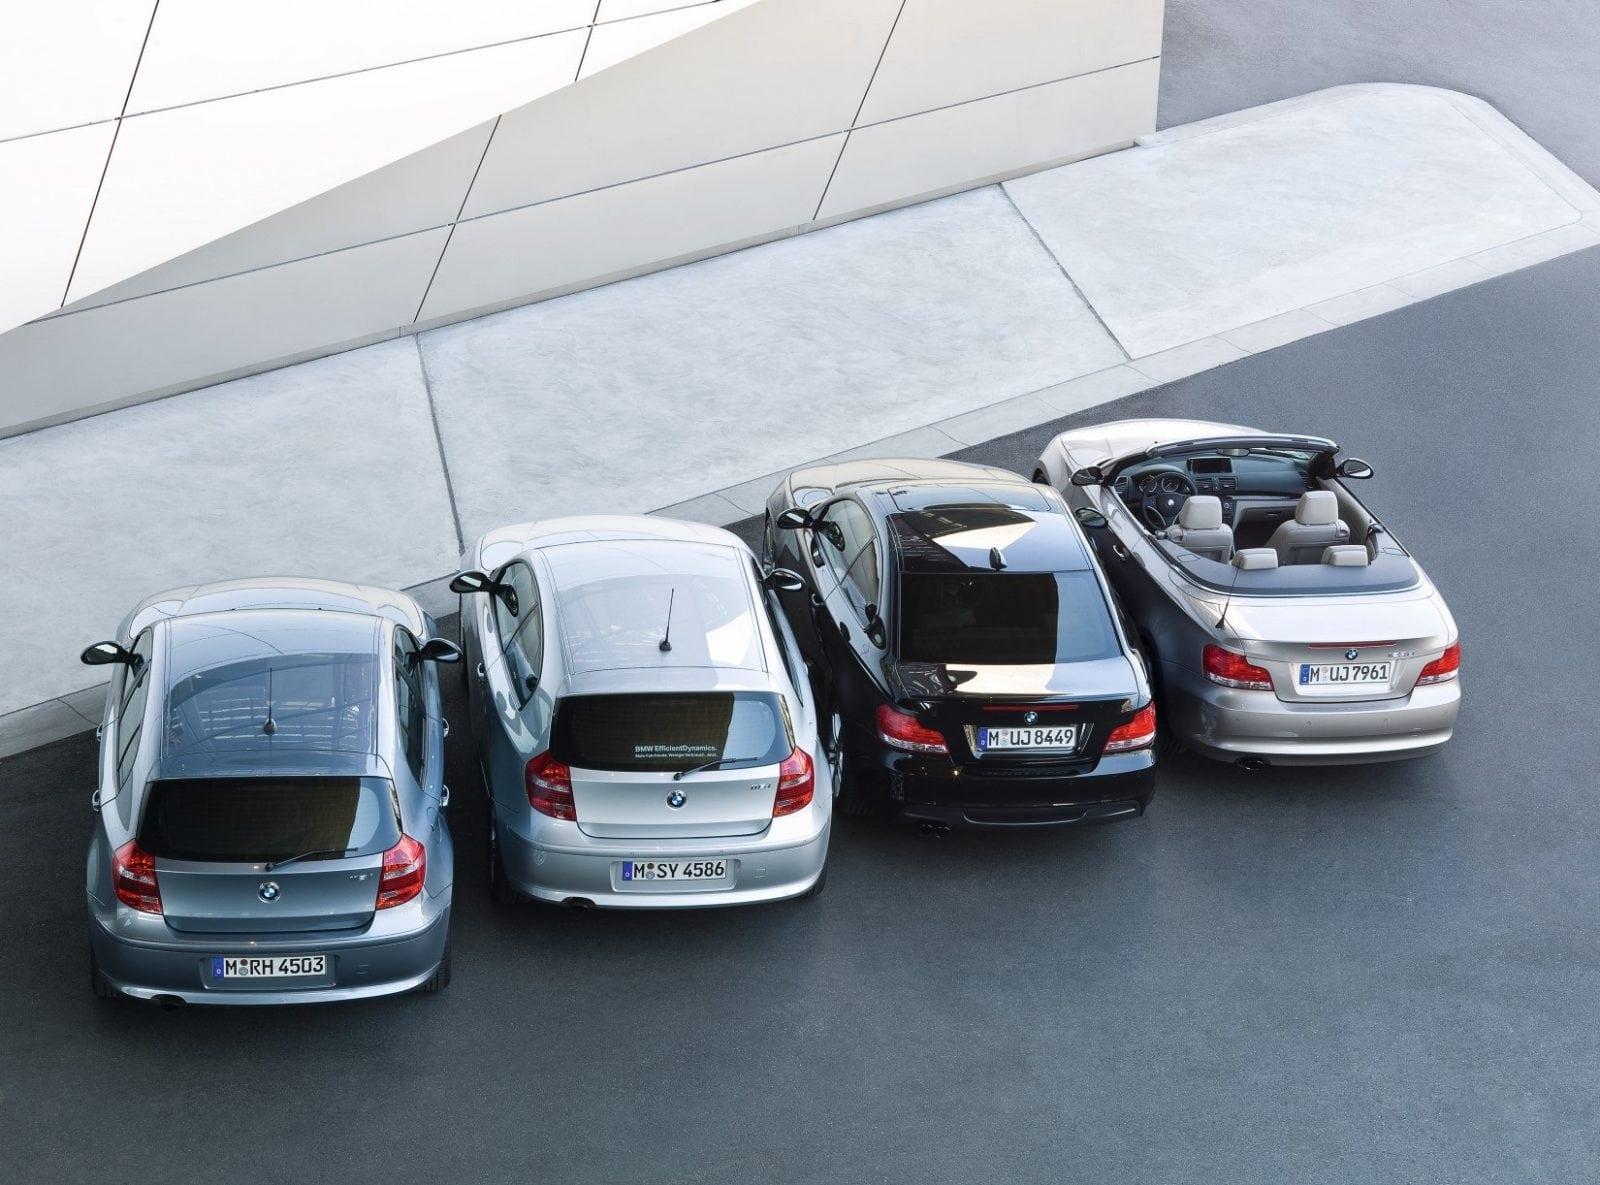 BMW 1 Series 2009 Model Range: E81, E82, E87, E88